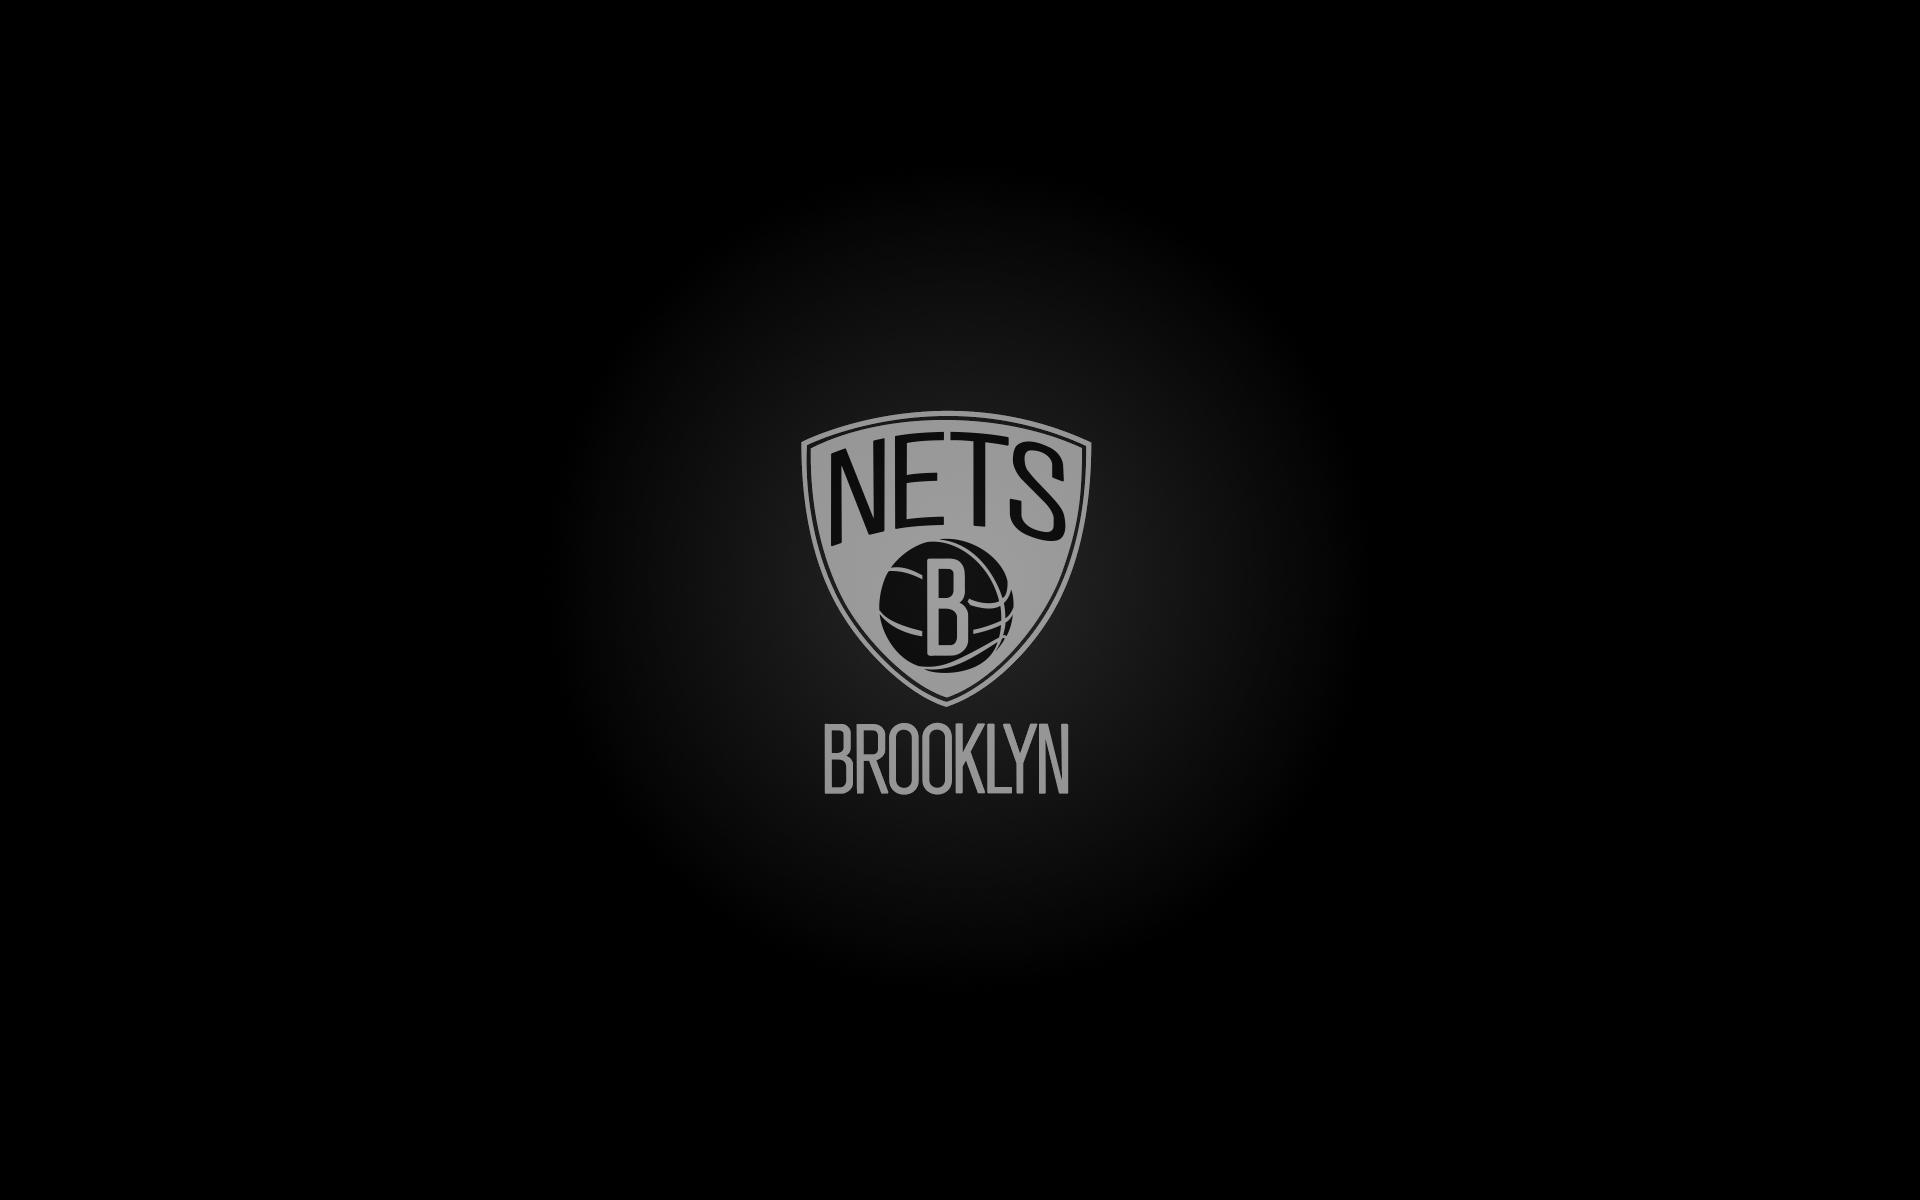 Brooklyn Nets Hd Wallpaper Background Image 1920x1200